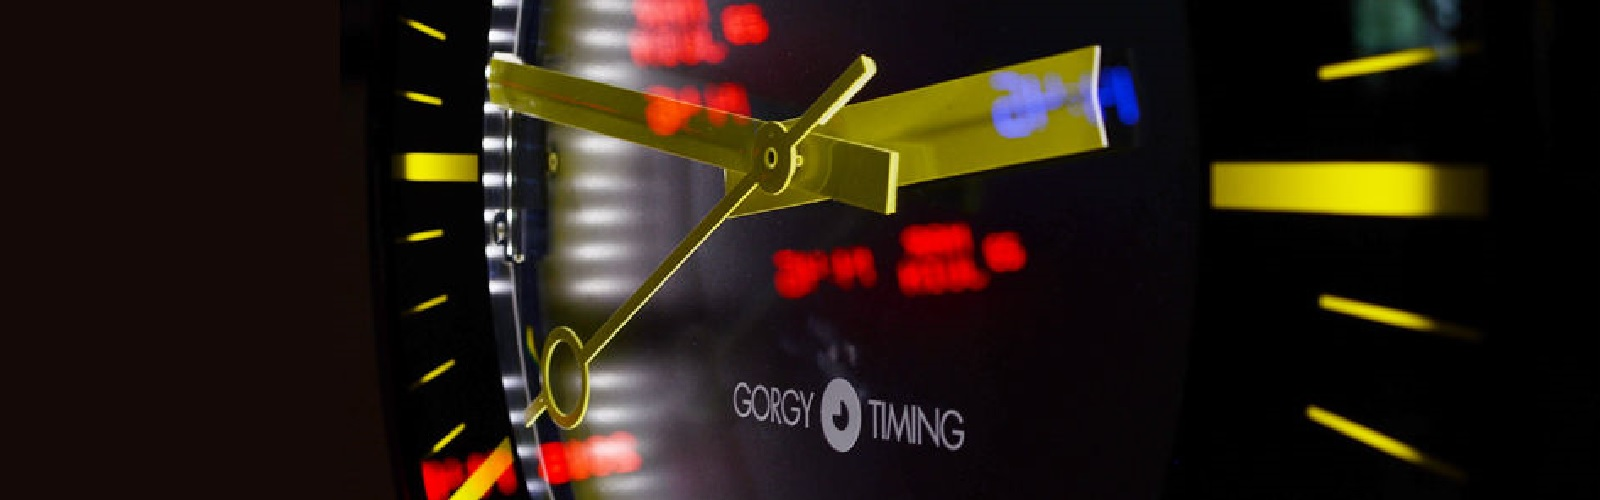 Gorgy Timing Clock Display